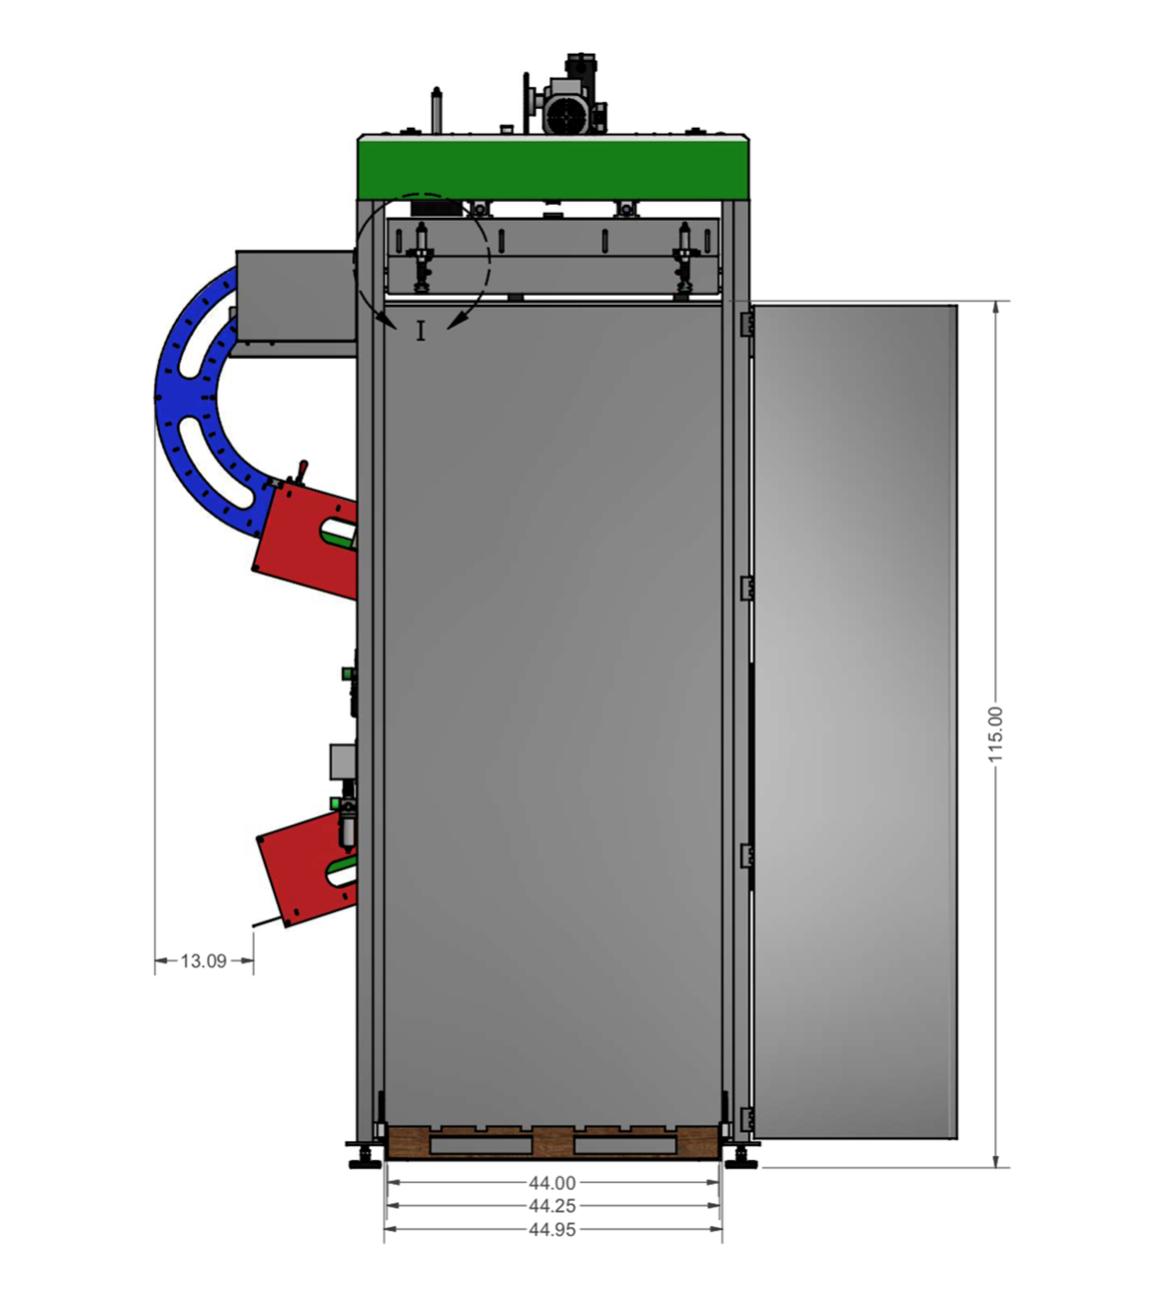 Micro Can Depalletizer Drawings